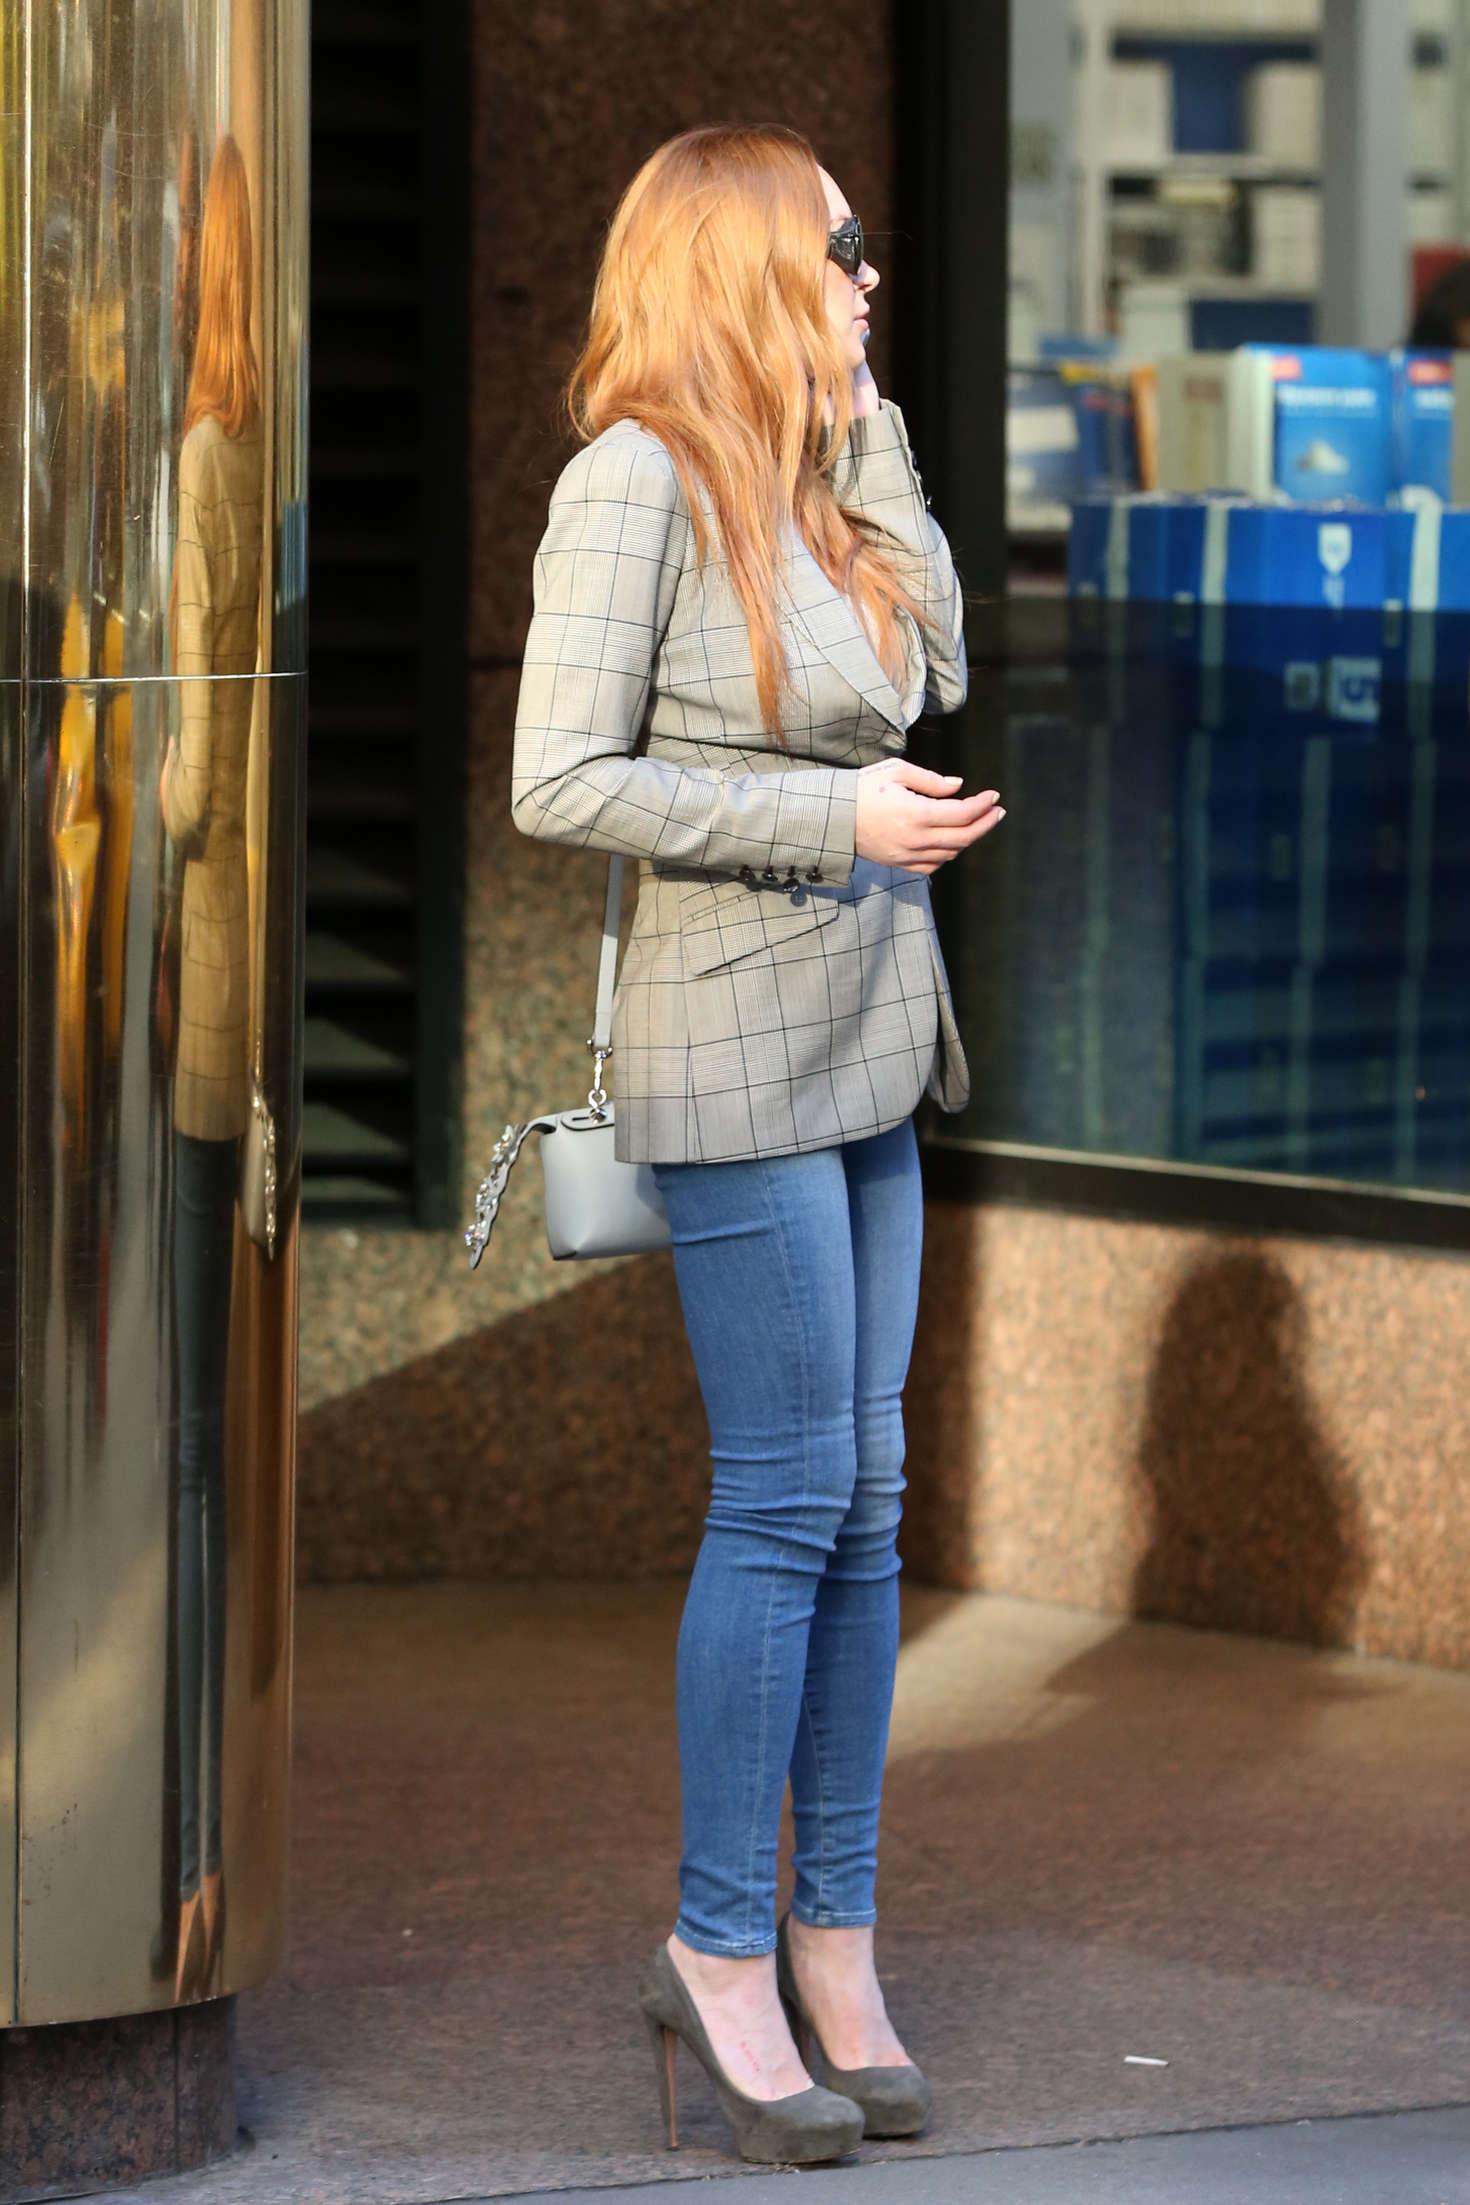 Lindsay Lohan 2016 : Lindsay Lohan on upper east side in New York -07